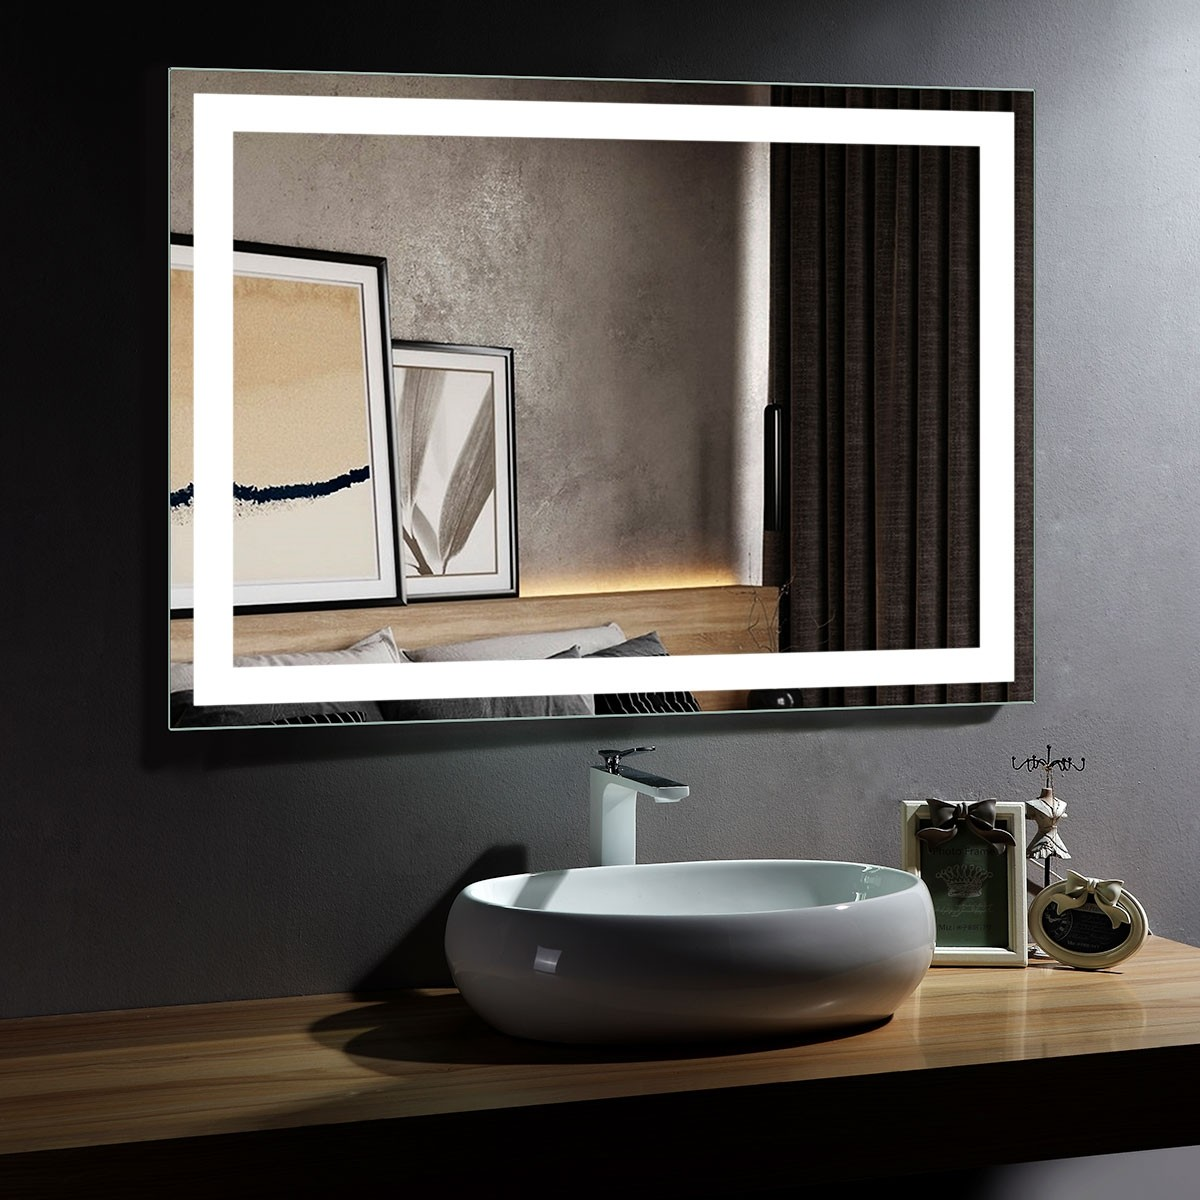 DECORAPORT 48 x 36 Inch LED Bathroom Mirror/Dress Mirror with Infrared Sensor Control, Anti-Fog, Vertical & Horizontal Mount (CG07-4836)